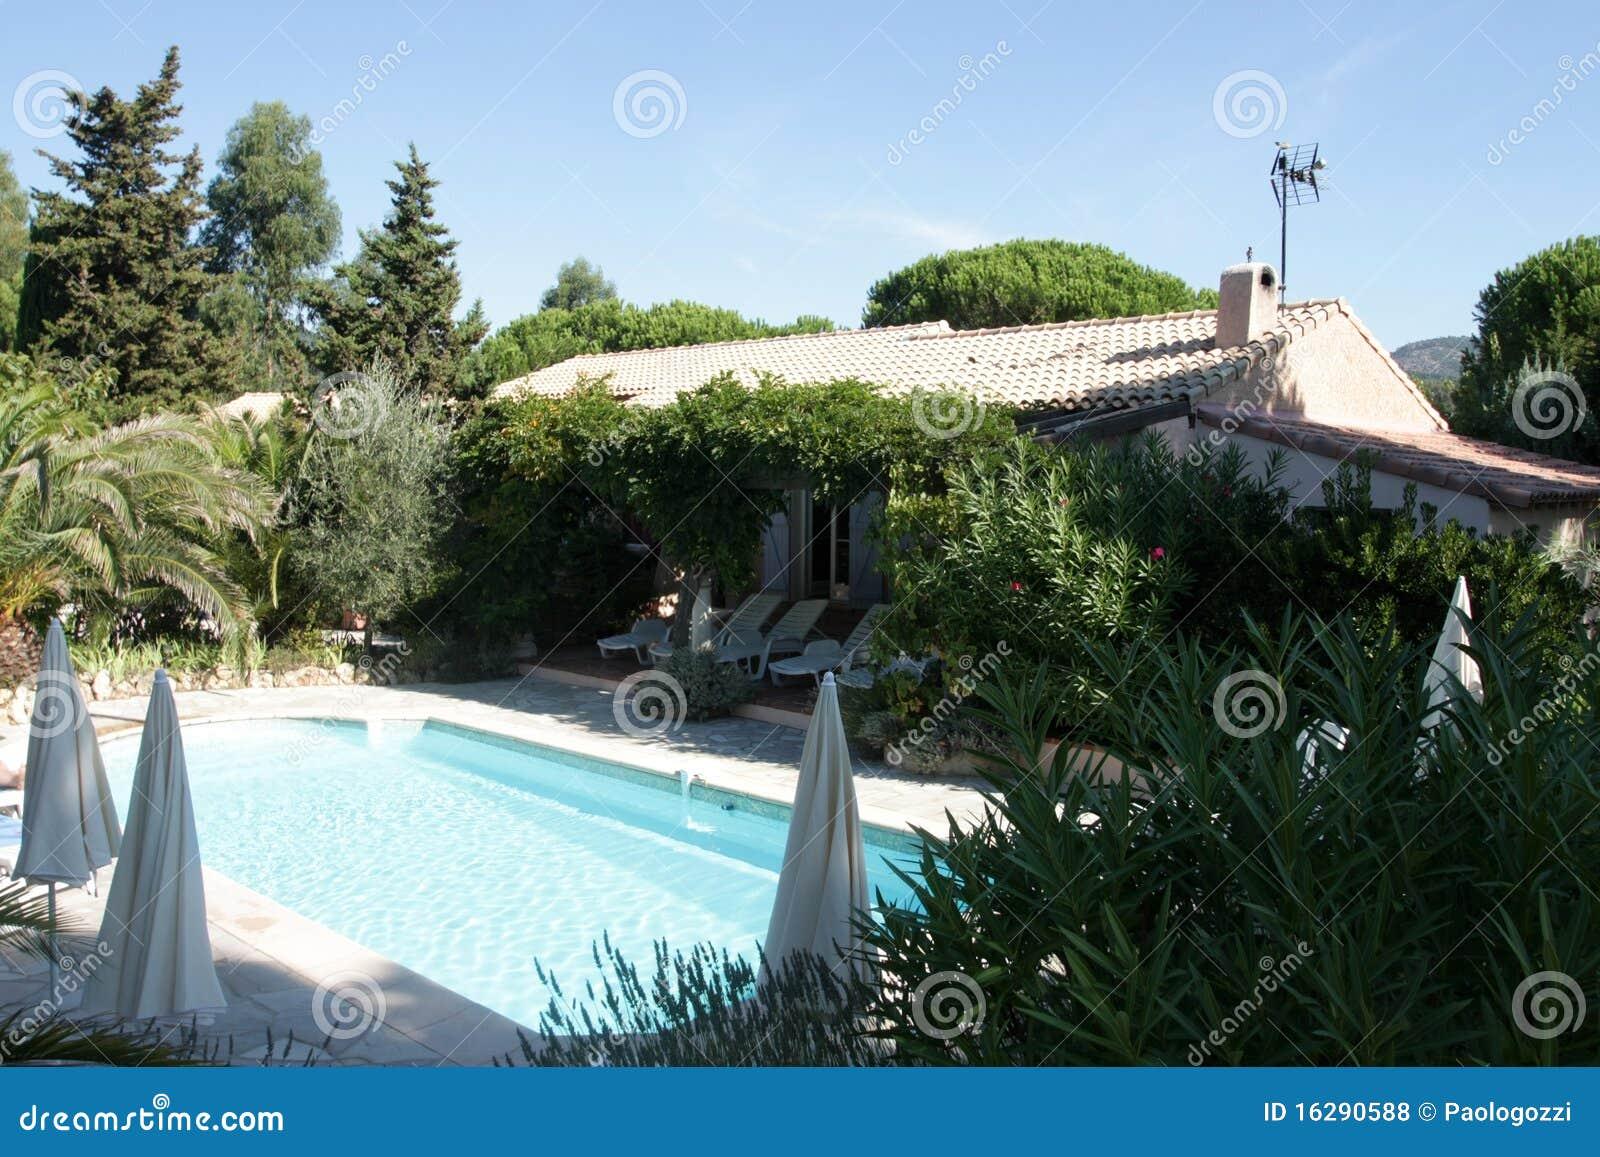 St Tropez villa with pool